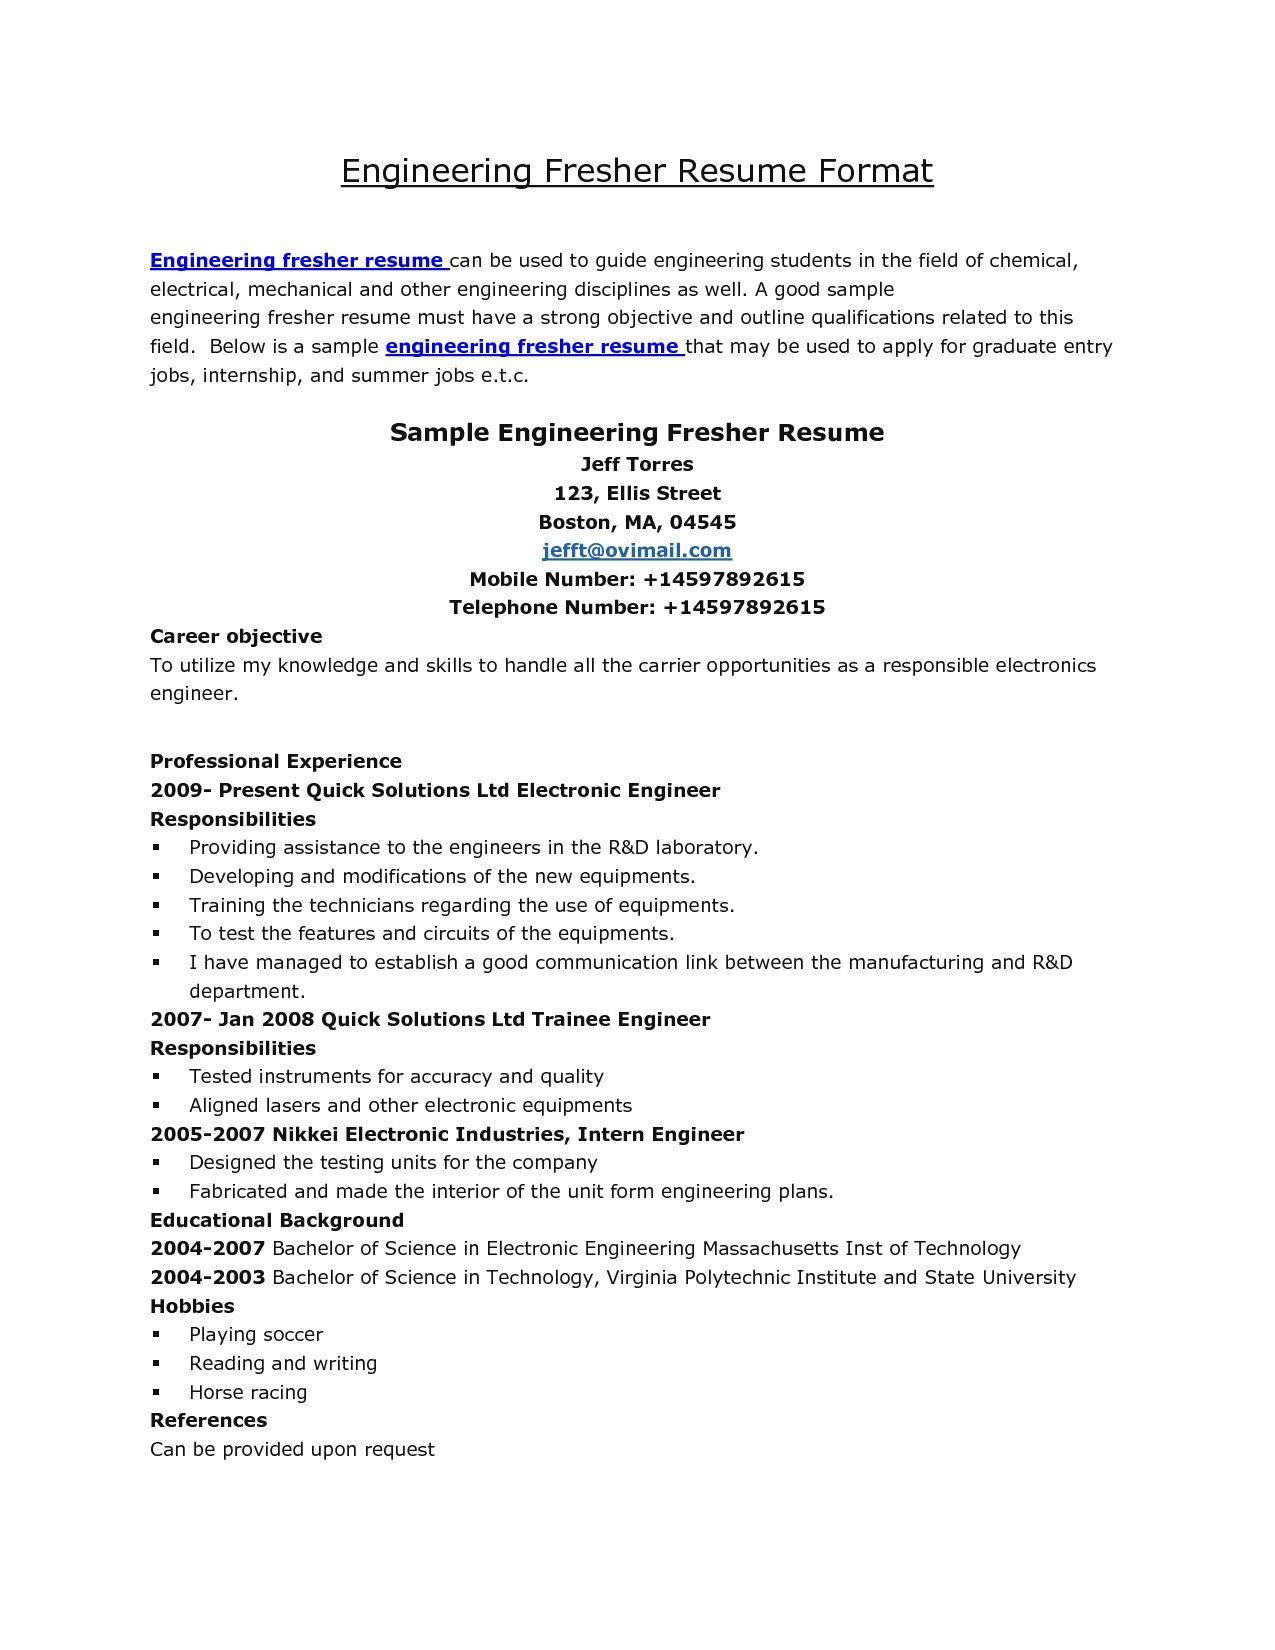 Resume formats for fresher engineer free resume